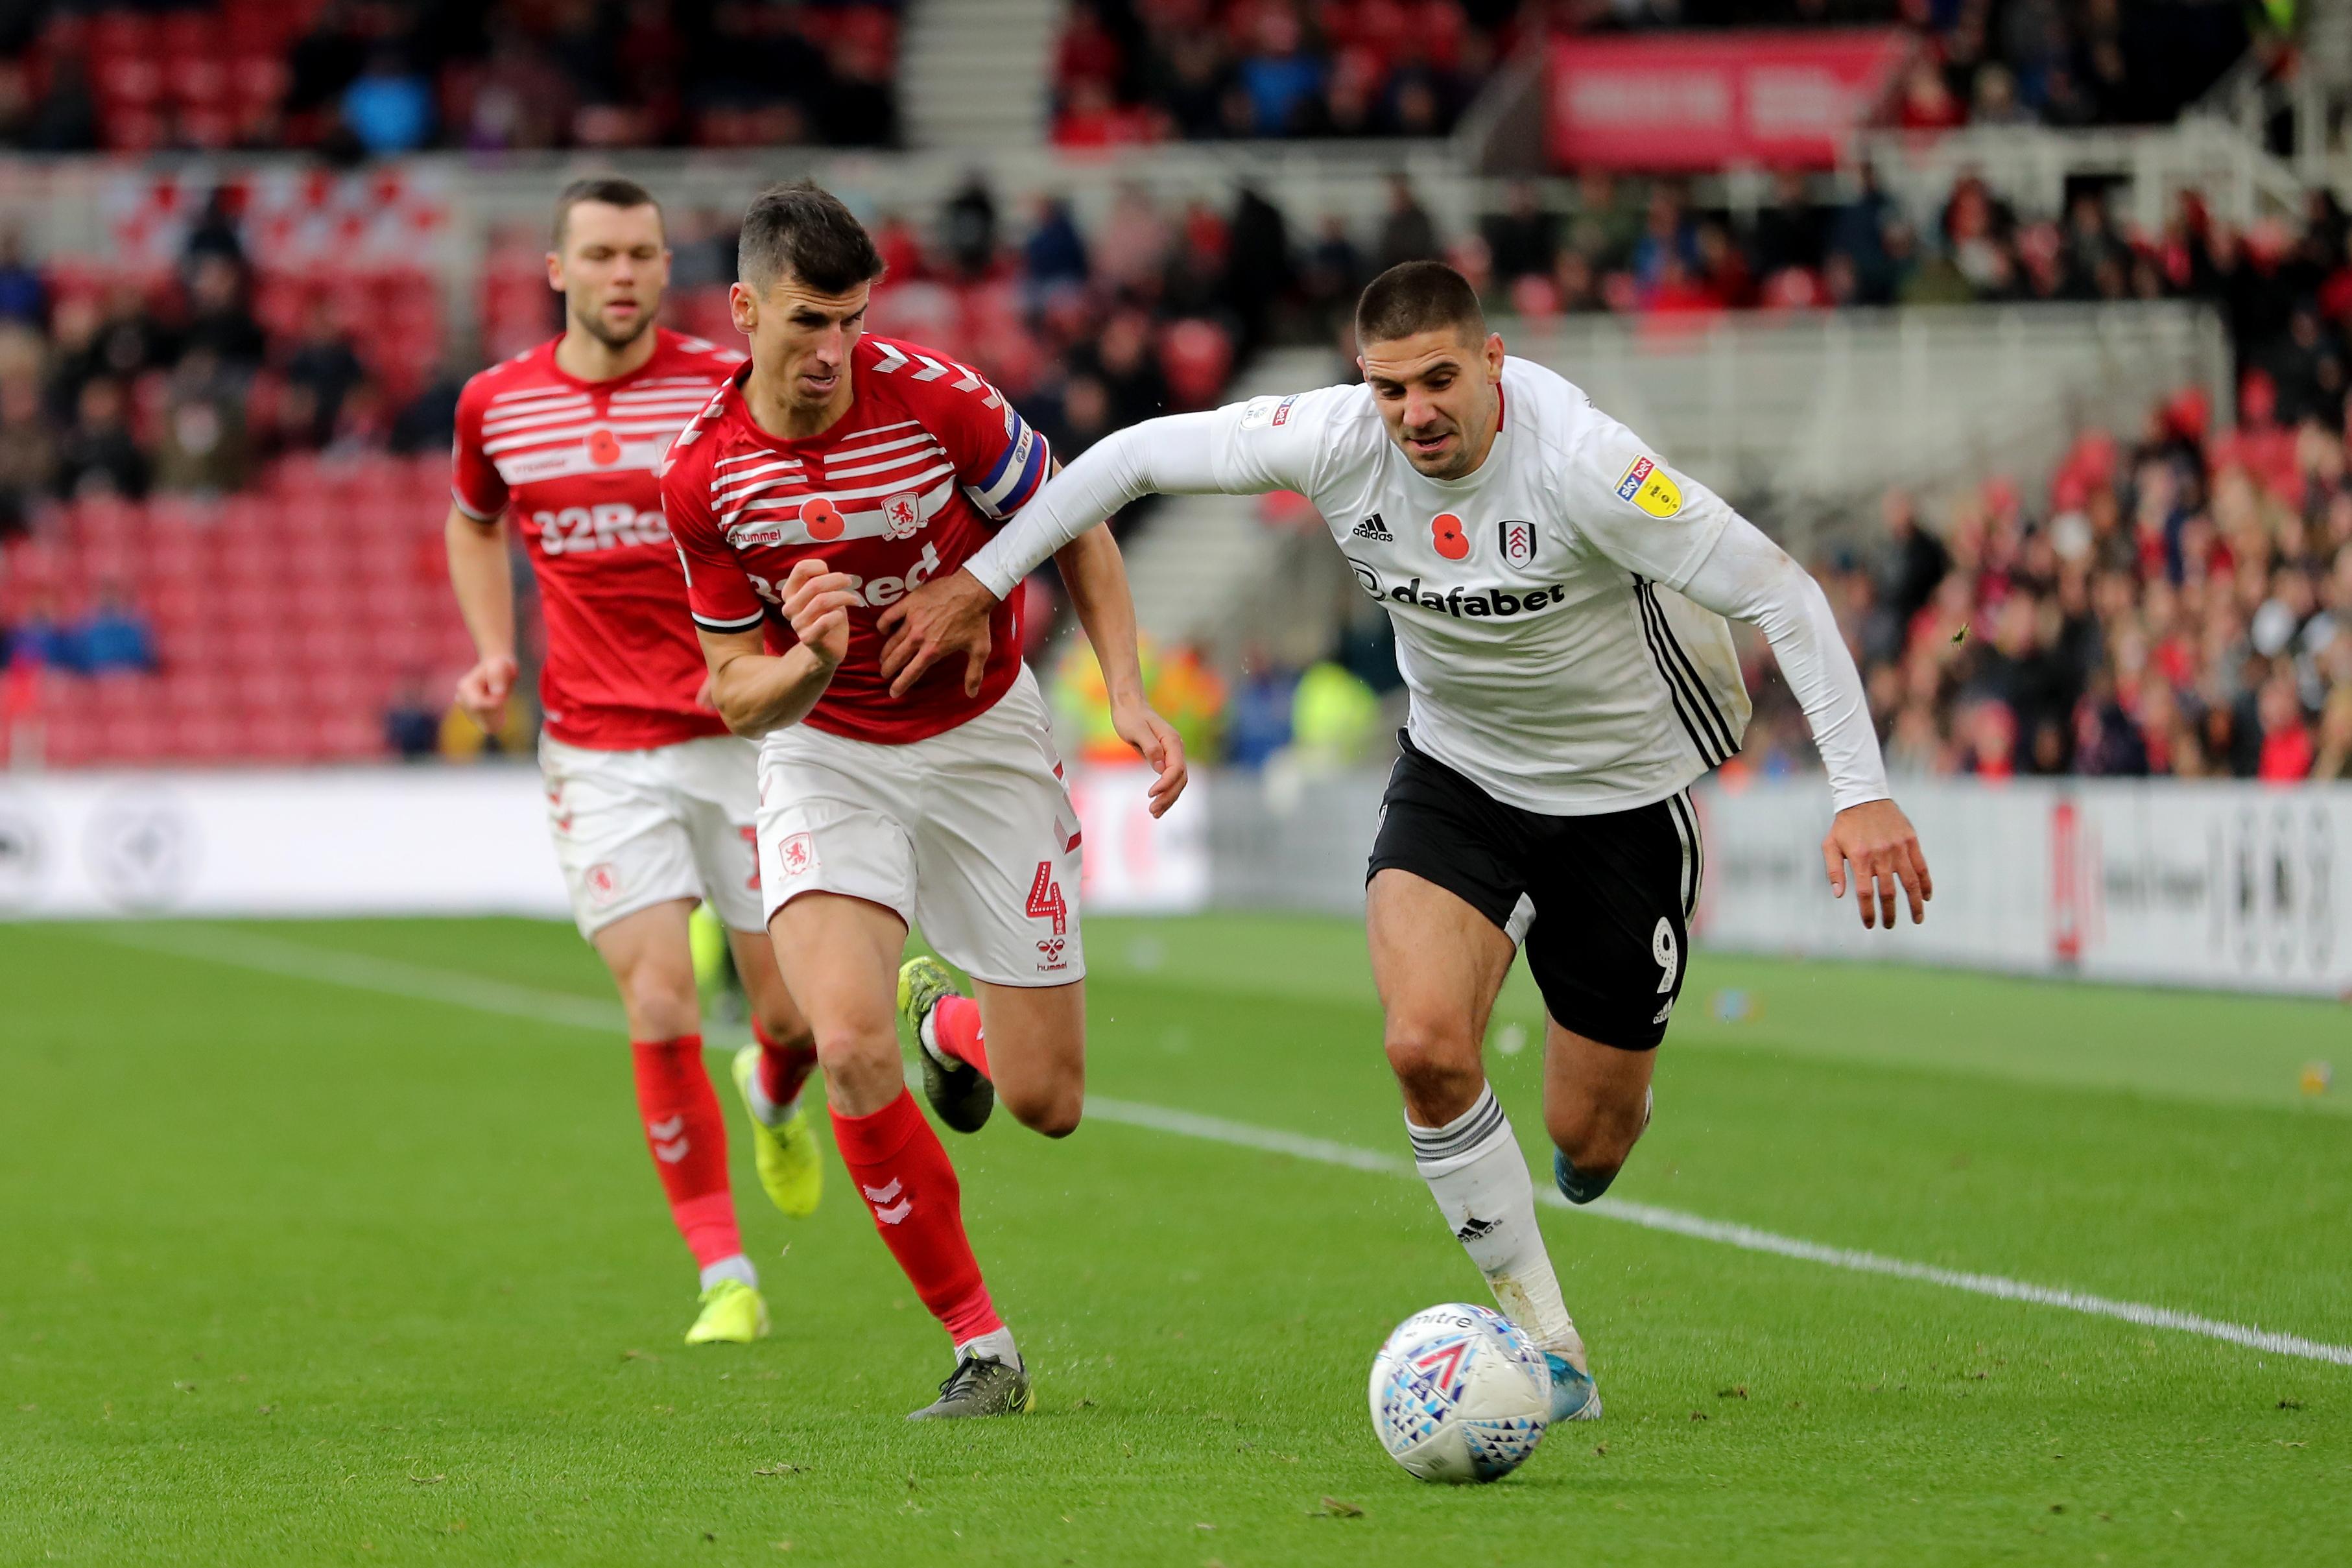 Middlesbrough v Fulham - Sky Bet Championship - Riverside Stadium